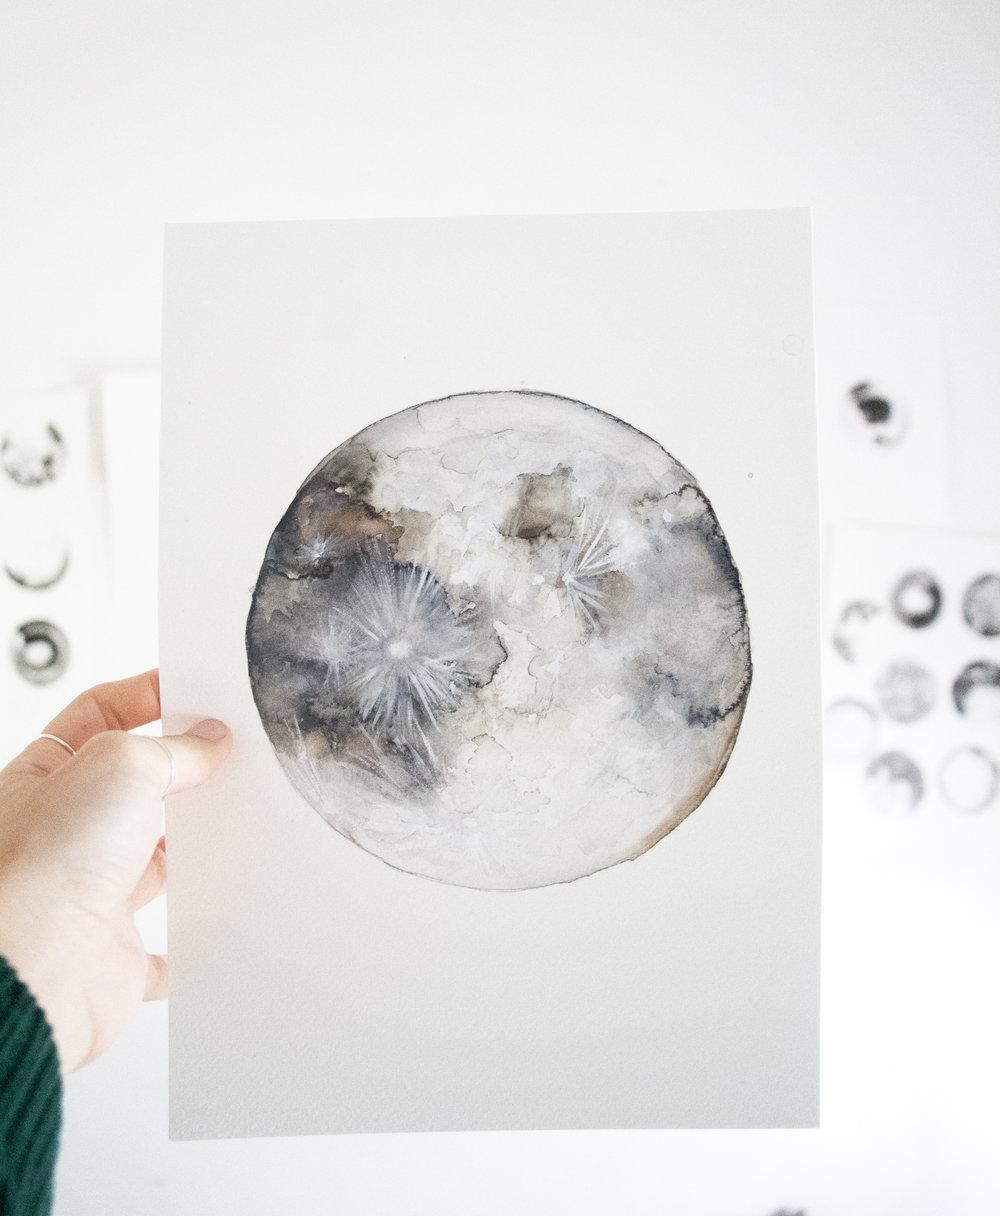 Cold+Moon+1.jpg